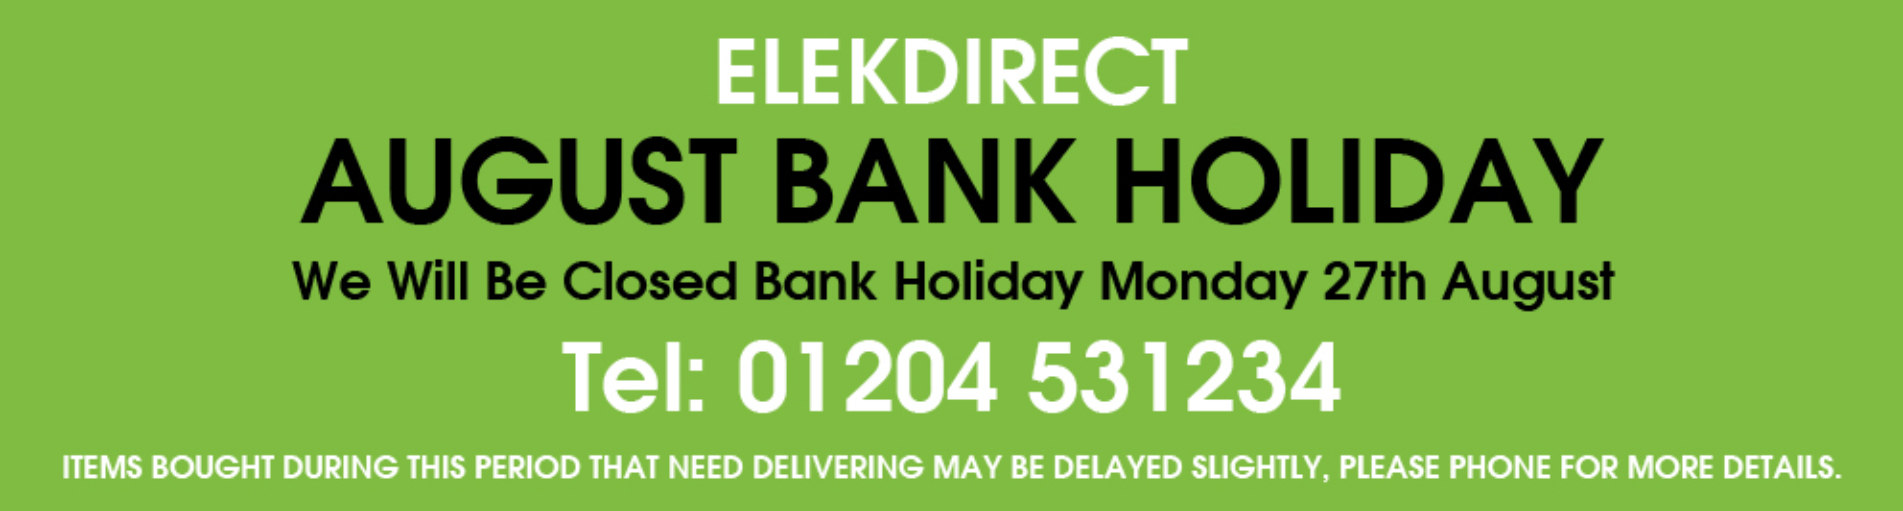 elek-direct-August-Bank-Hol—-WEB-banner